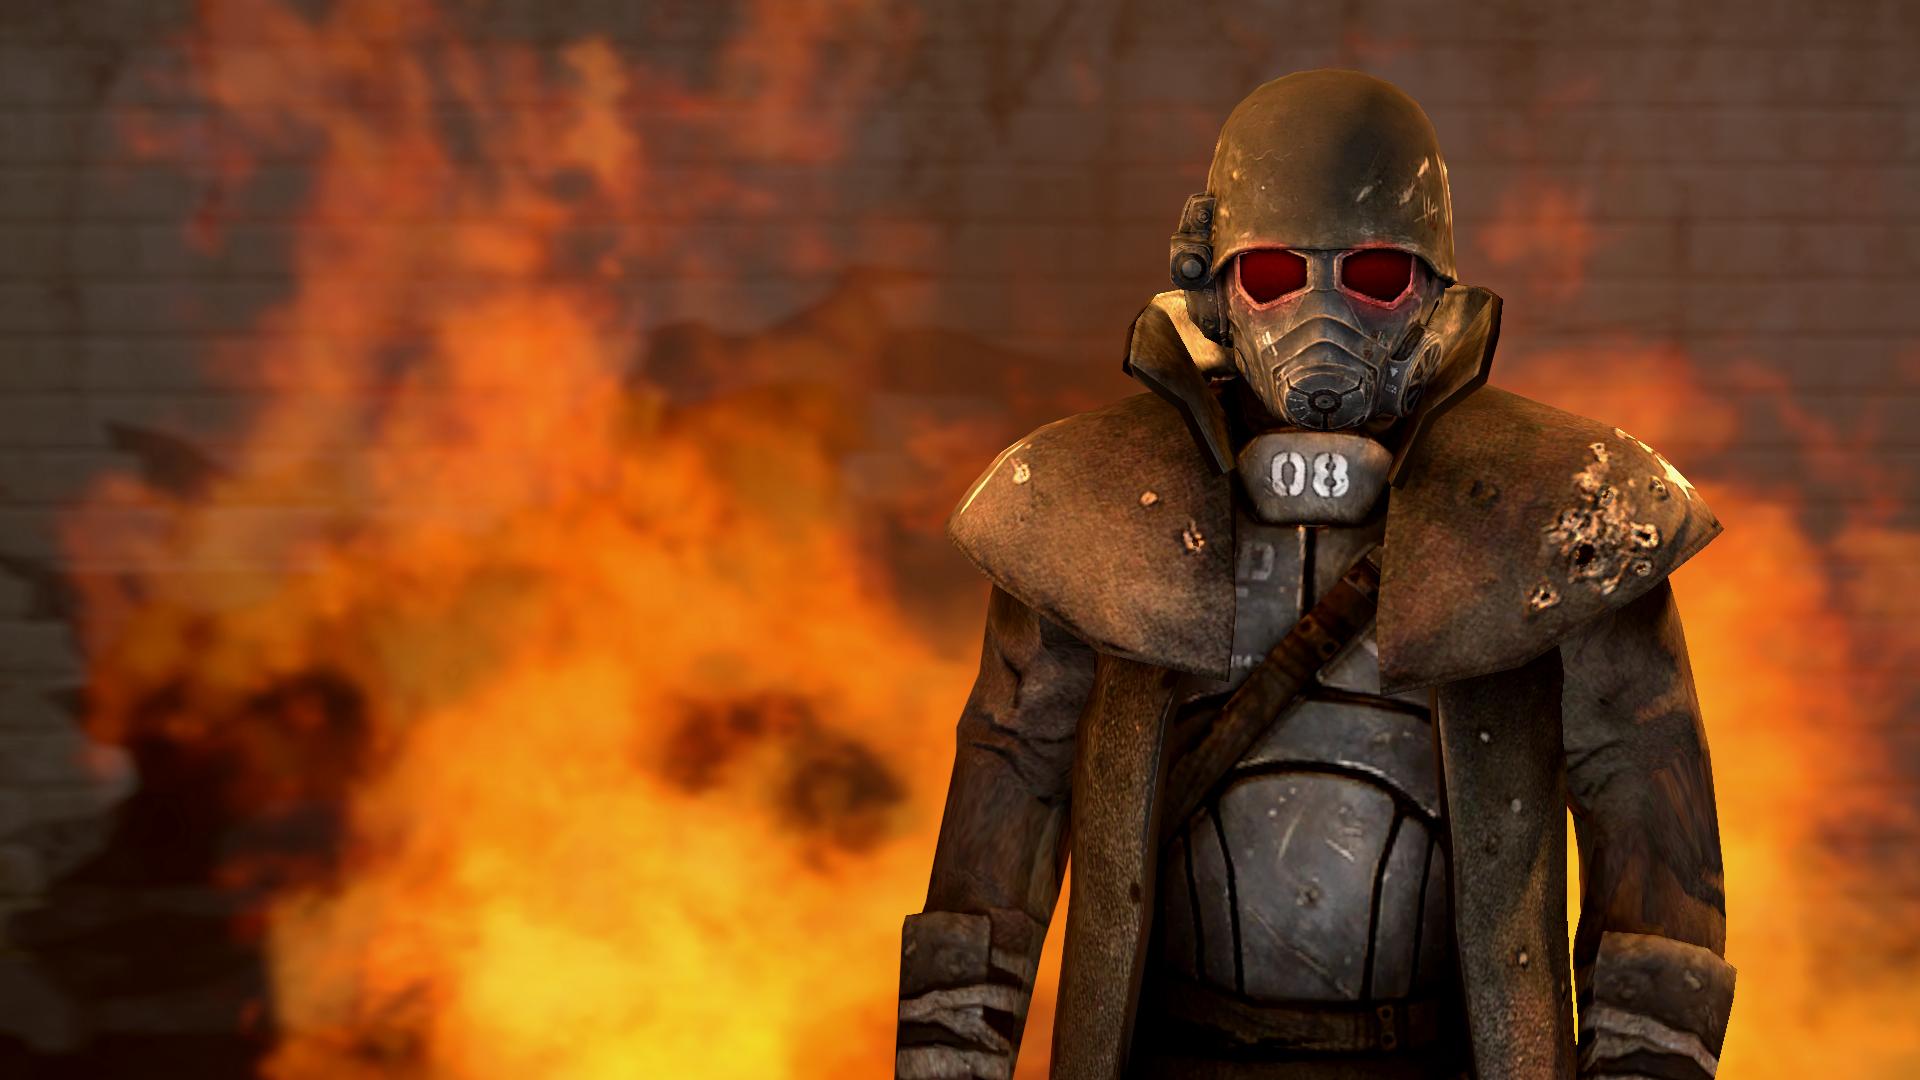 Ролевые игры, Obsidian Entertainment, Bethesda Game Studios, Fallout: New Vegas